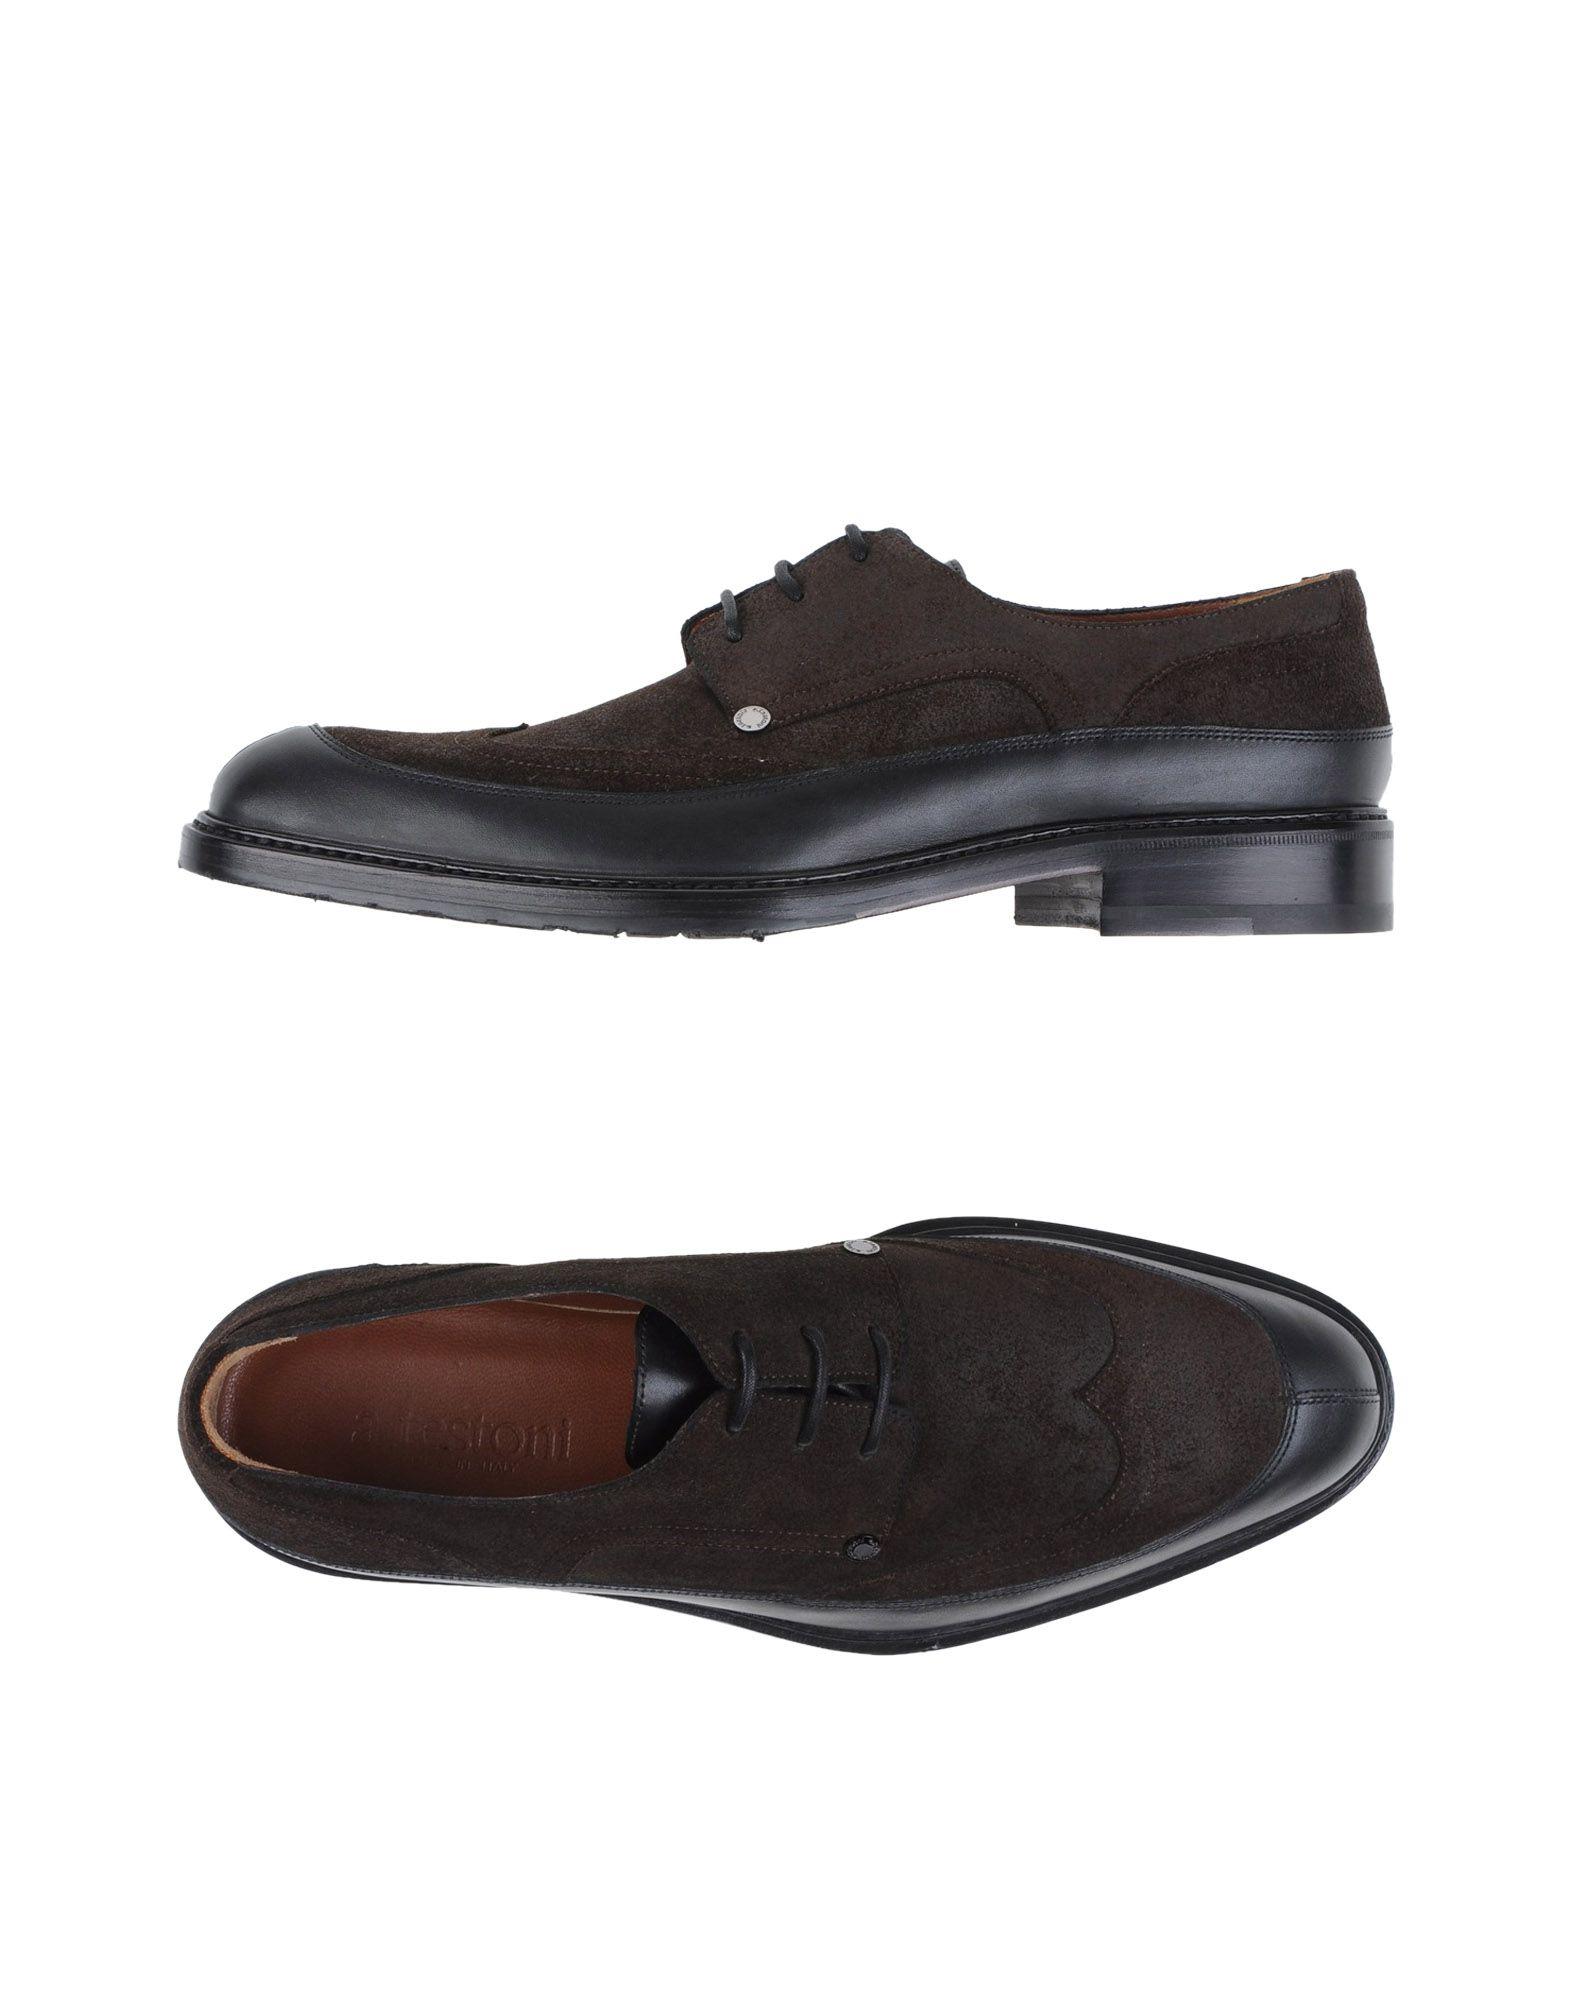 A.TESTONI Lace-up shoes